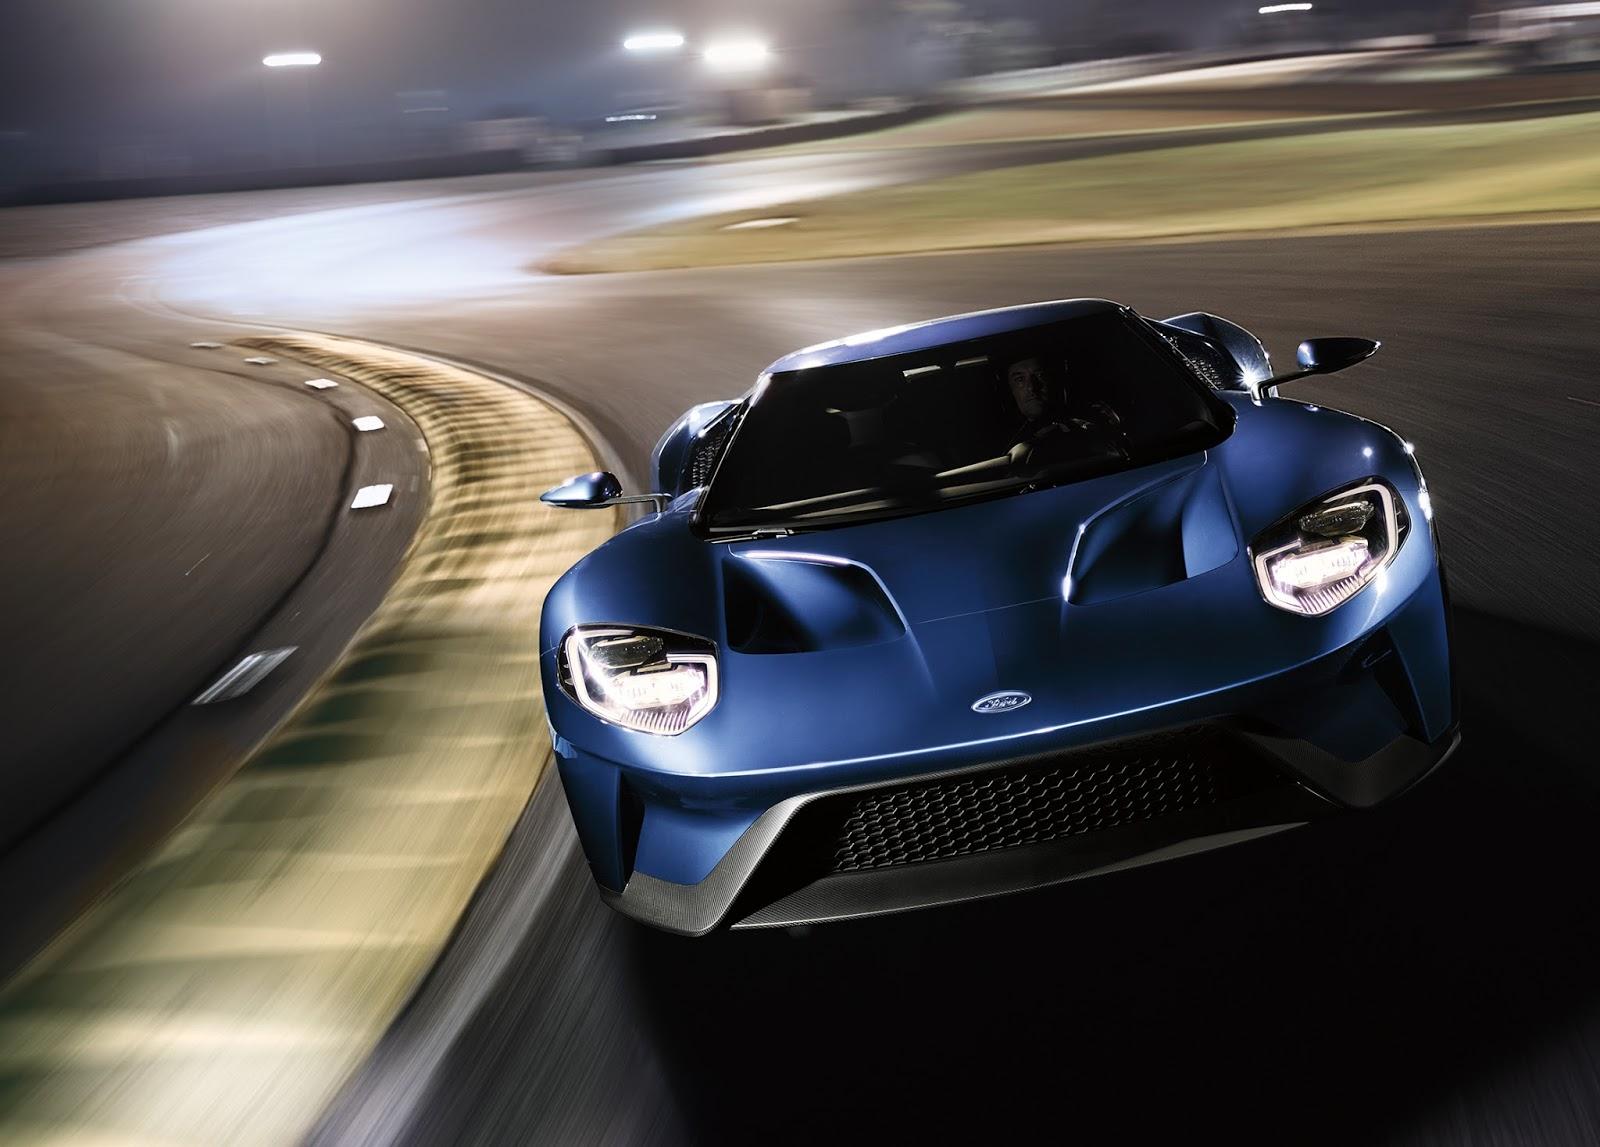 17 MISC GTOnTrack mn Το νέο Ford GT είναι το ταχύτερο μοντέλο παραγωγής στην ιστορία της Ford